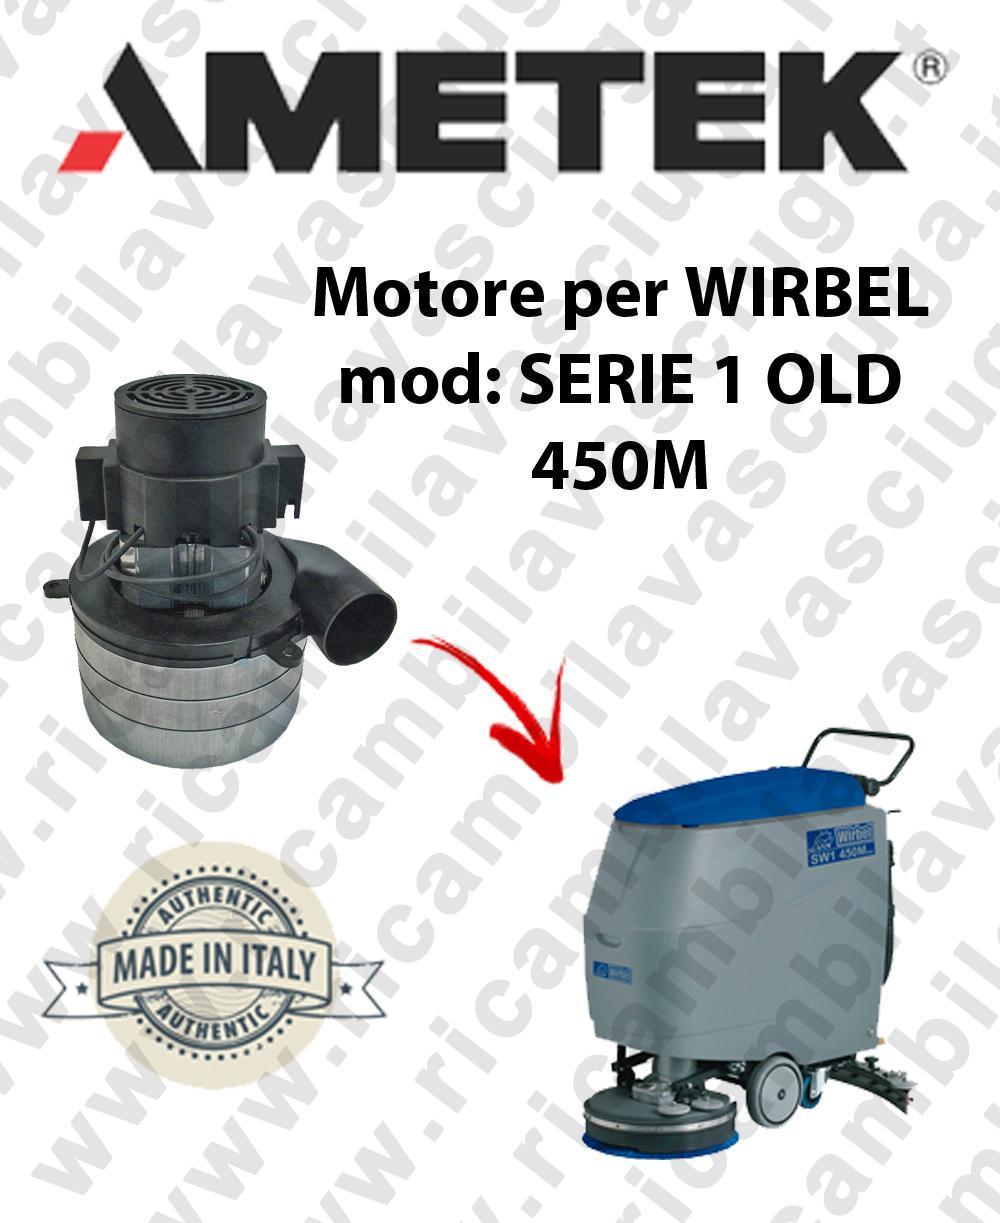 SERIE 1 OLD 450M Motore de aspiración AMETEK para fregadora WIRBEL